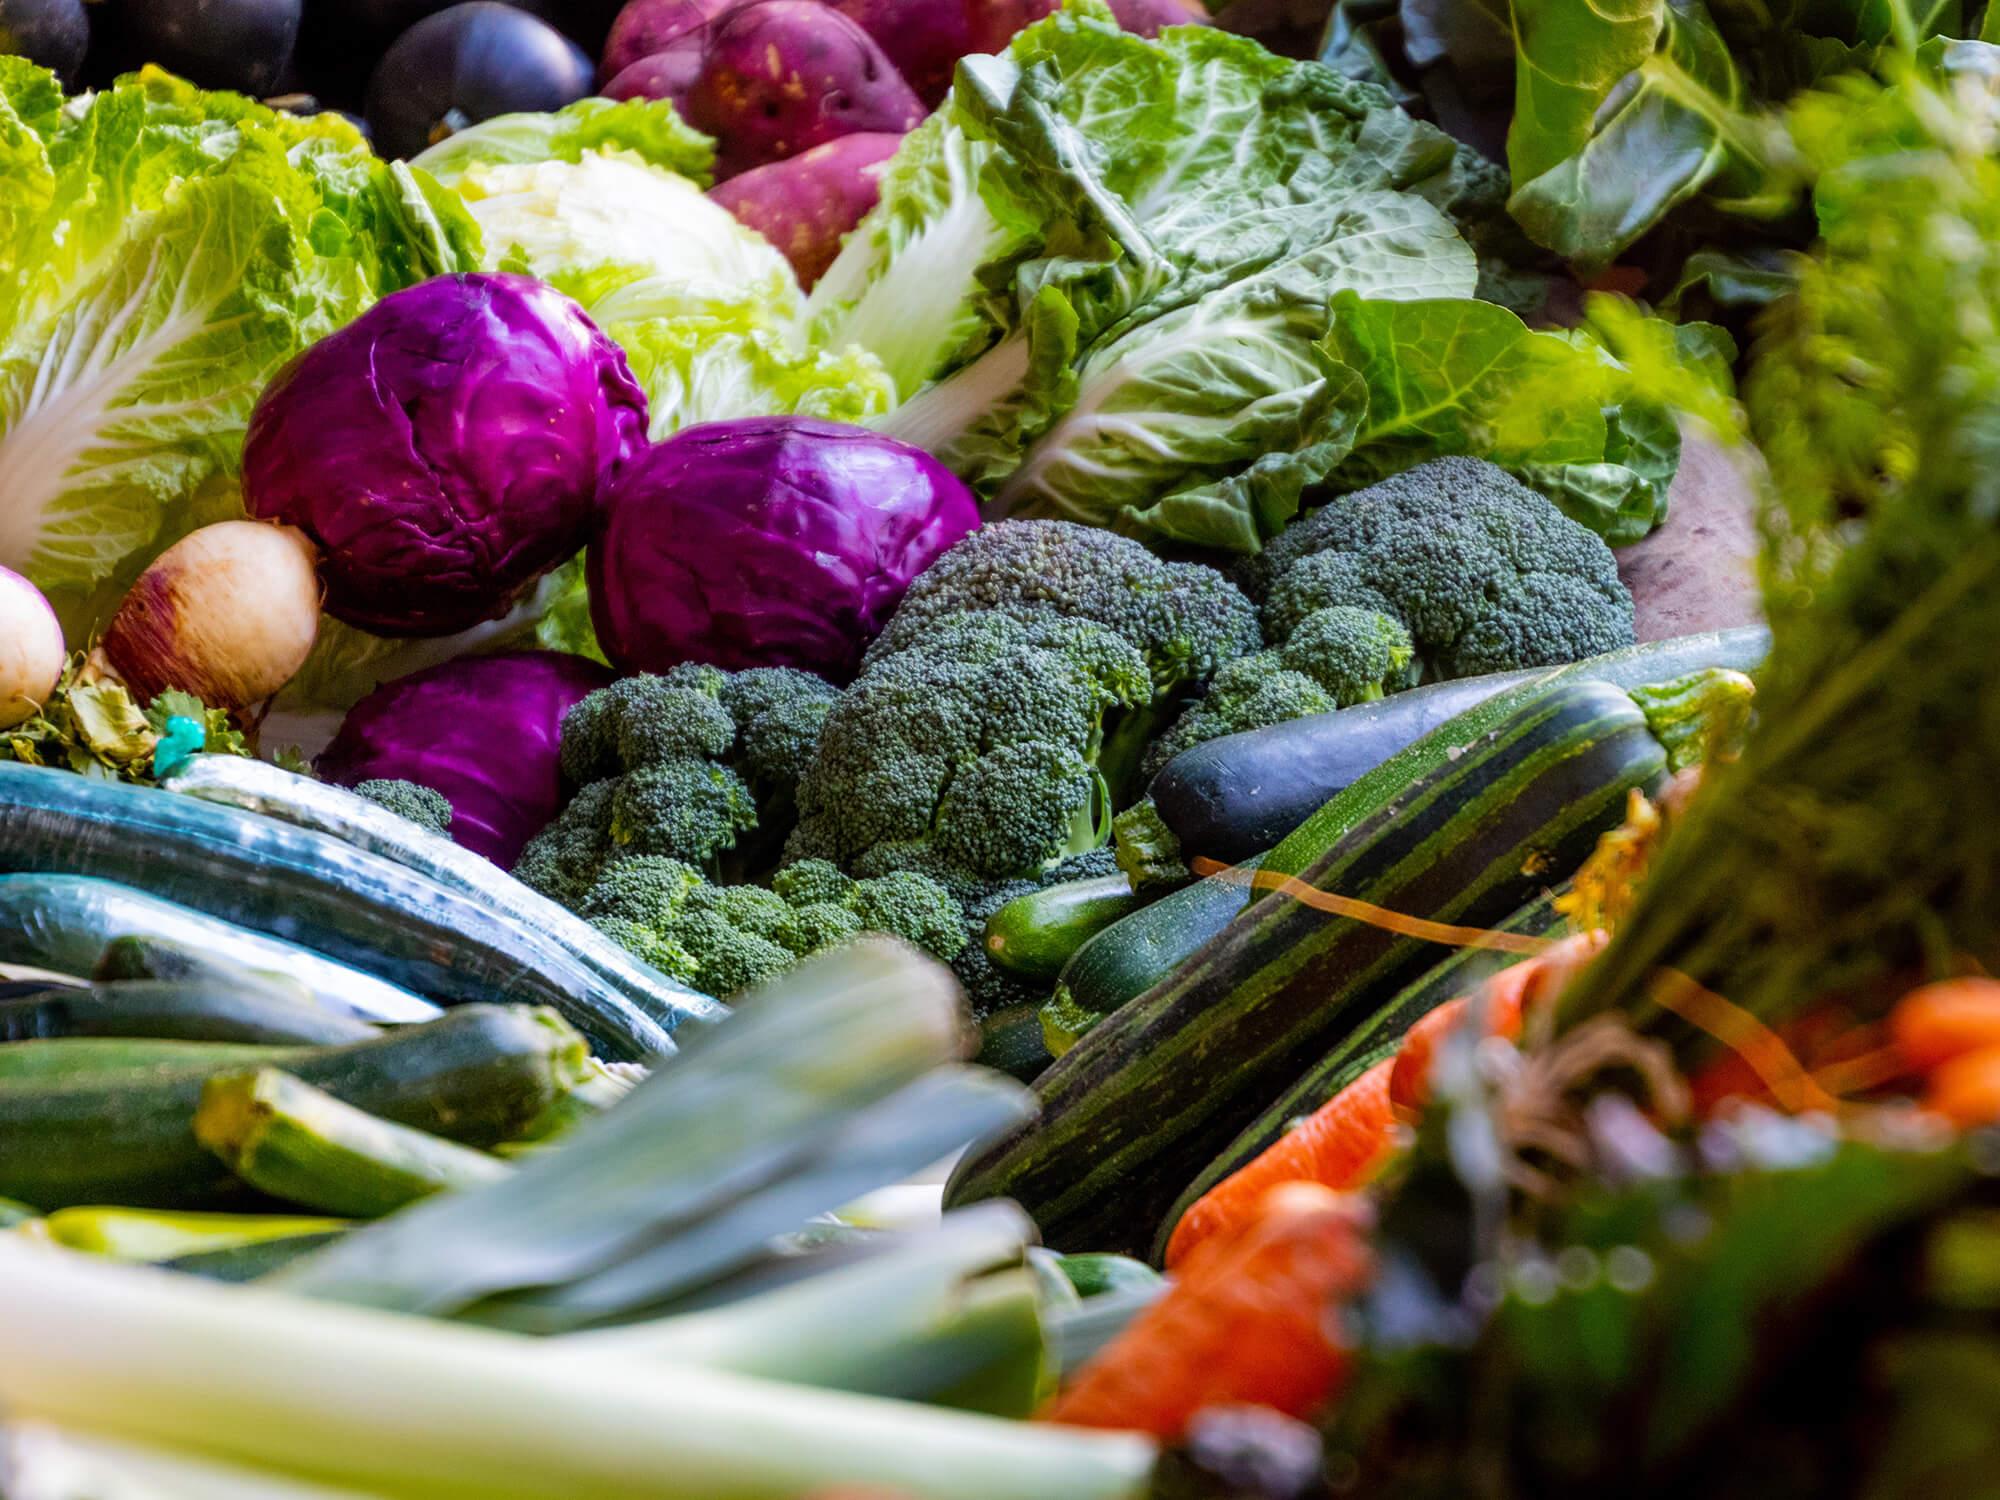 fresh vegetables on a market stall